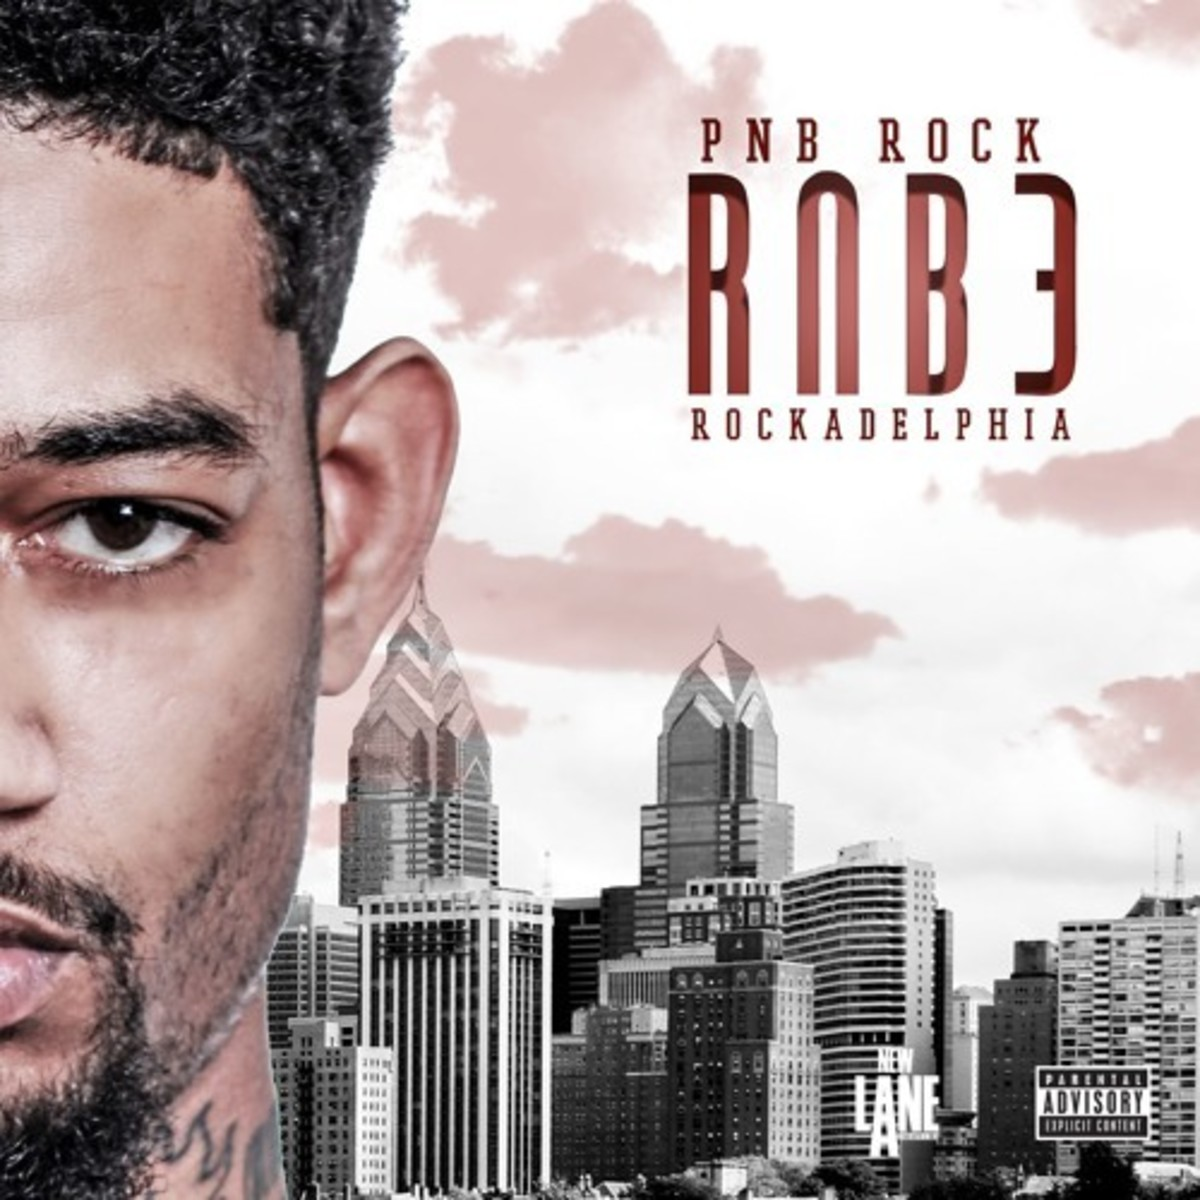 pnb-rock-rnb-3.jpg